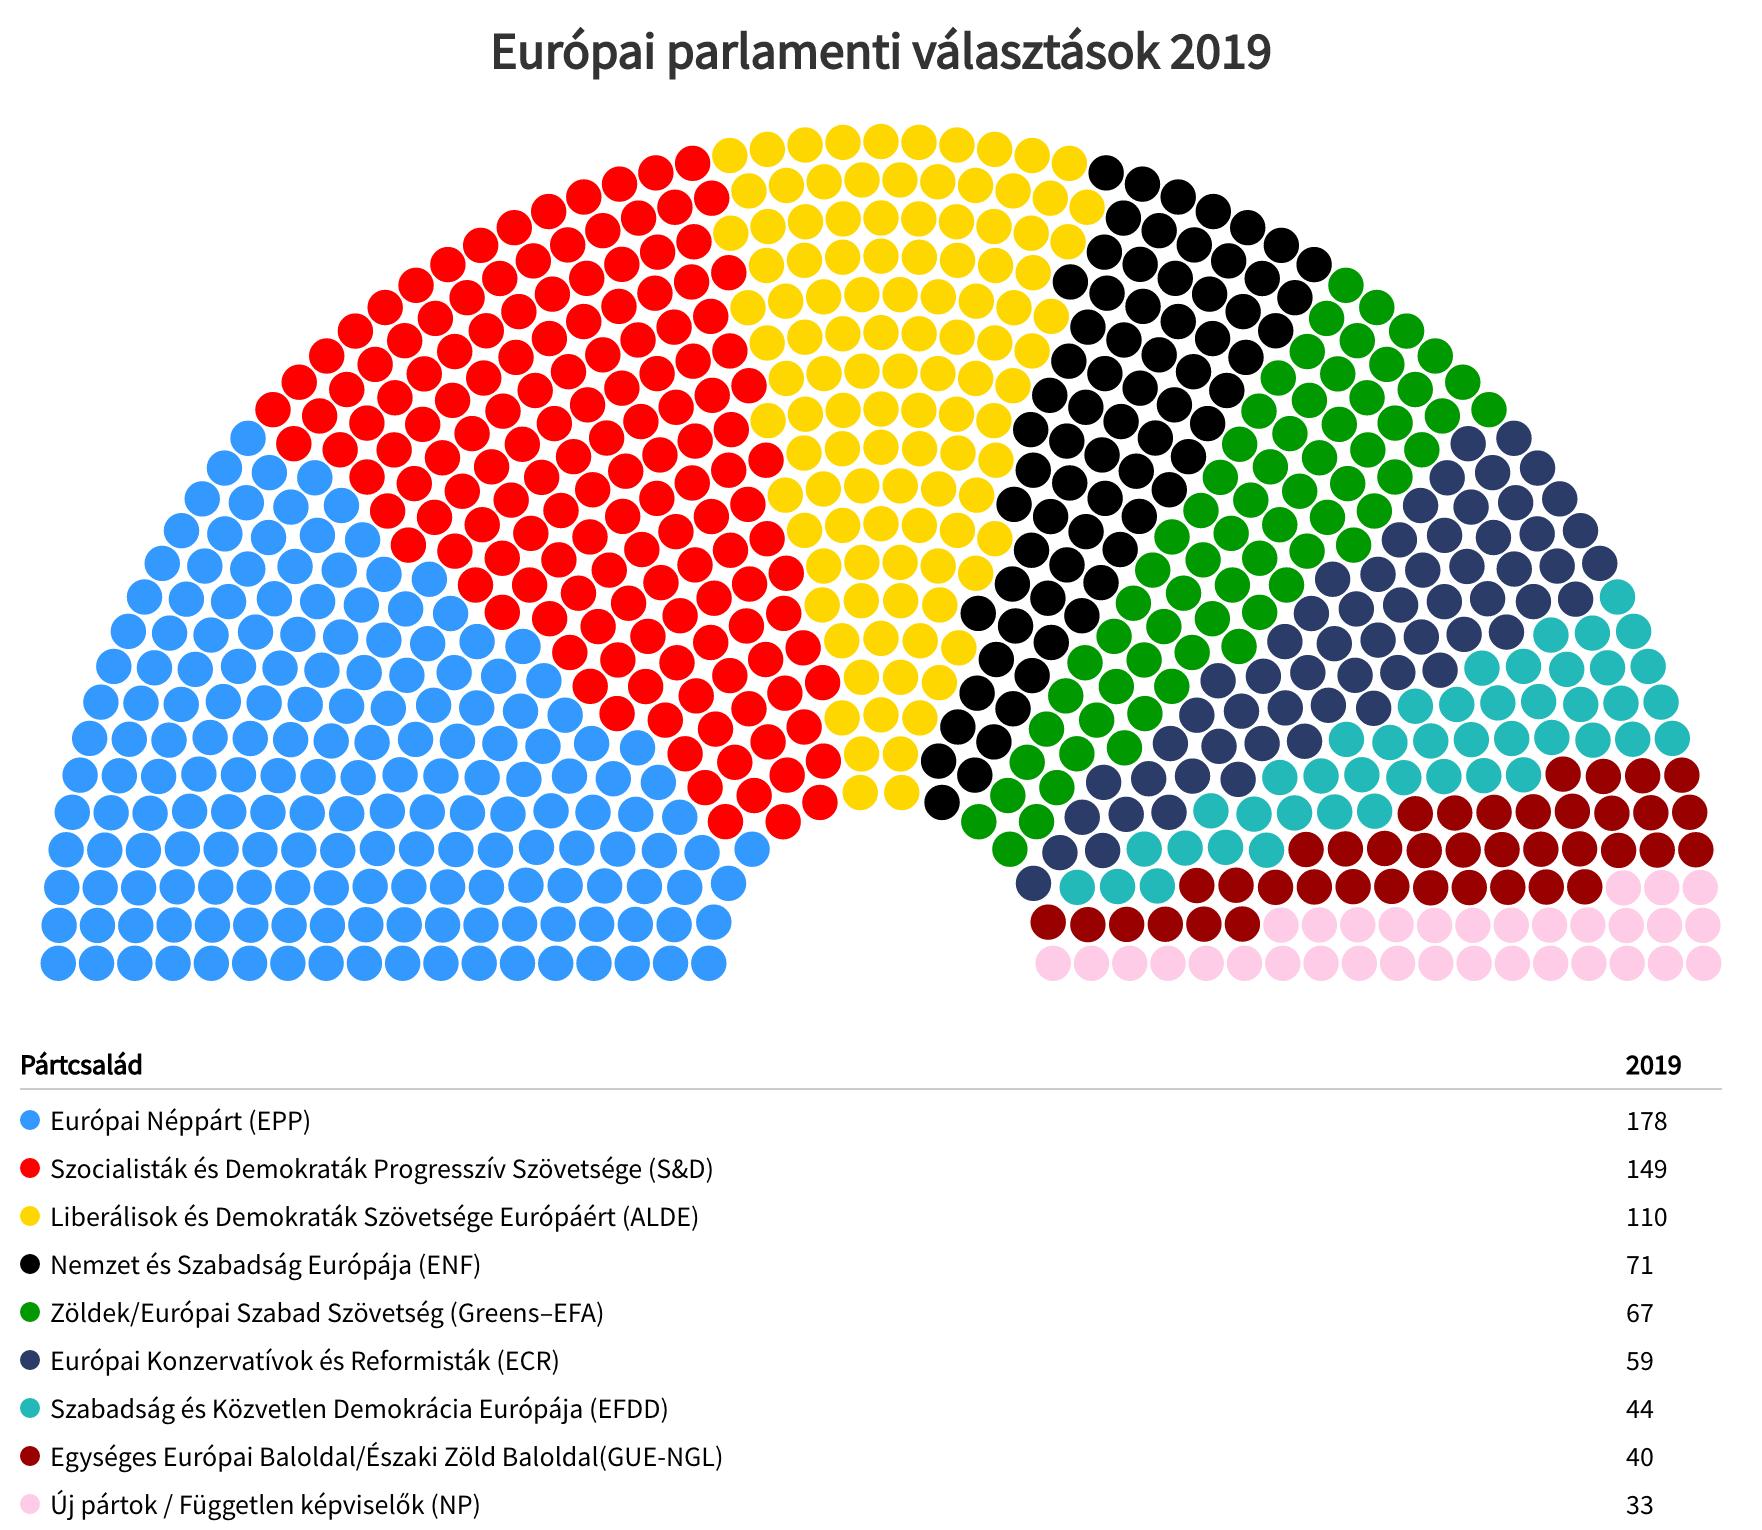 europaivalasztasok_2x.png